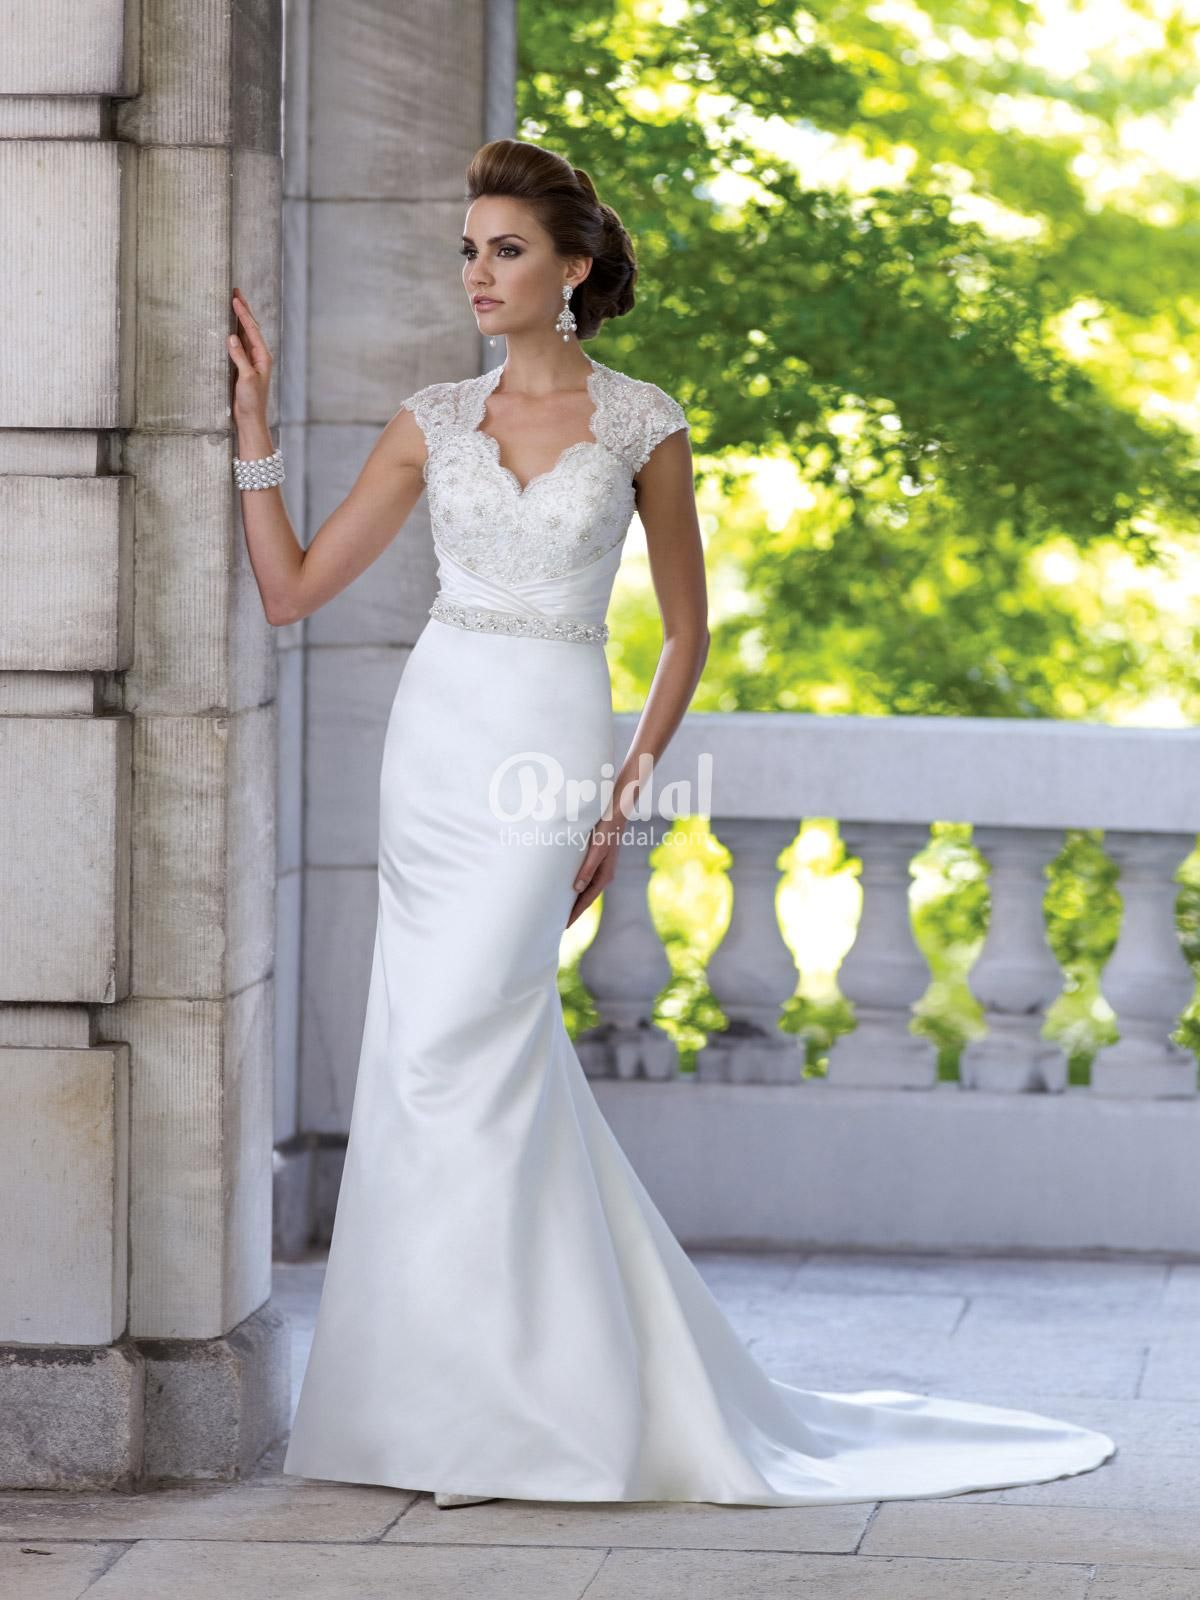 vintage beaded satin sheath a-line wedding dress with cap sleeves